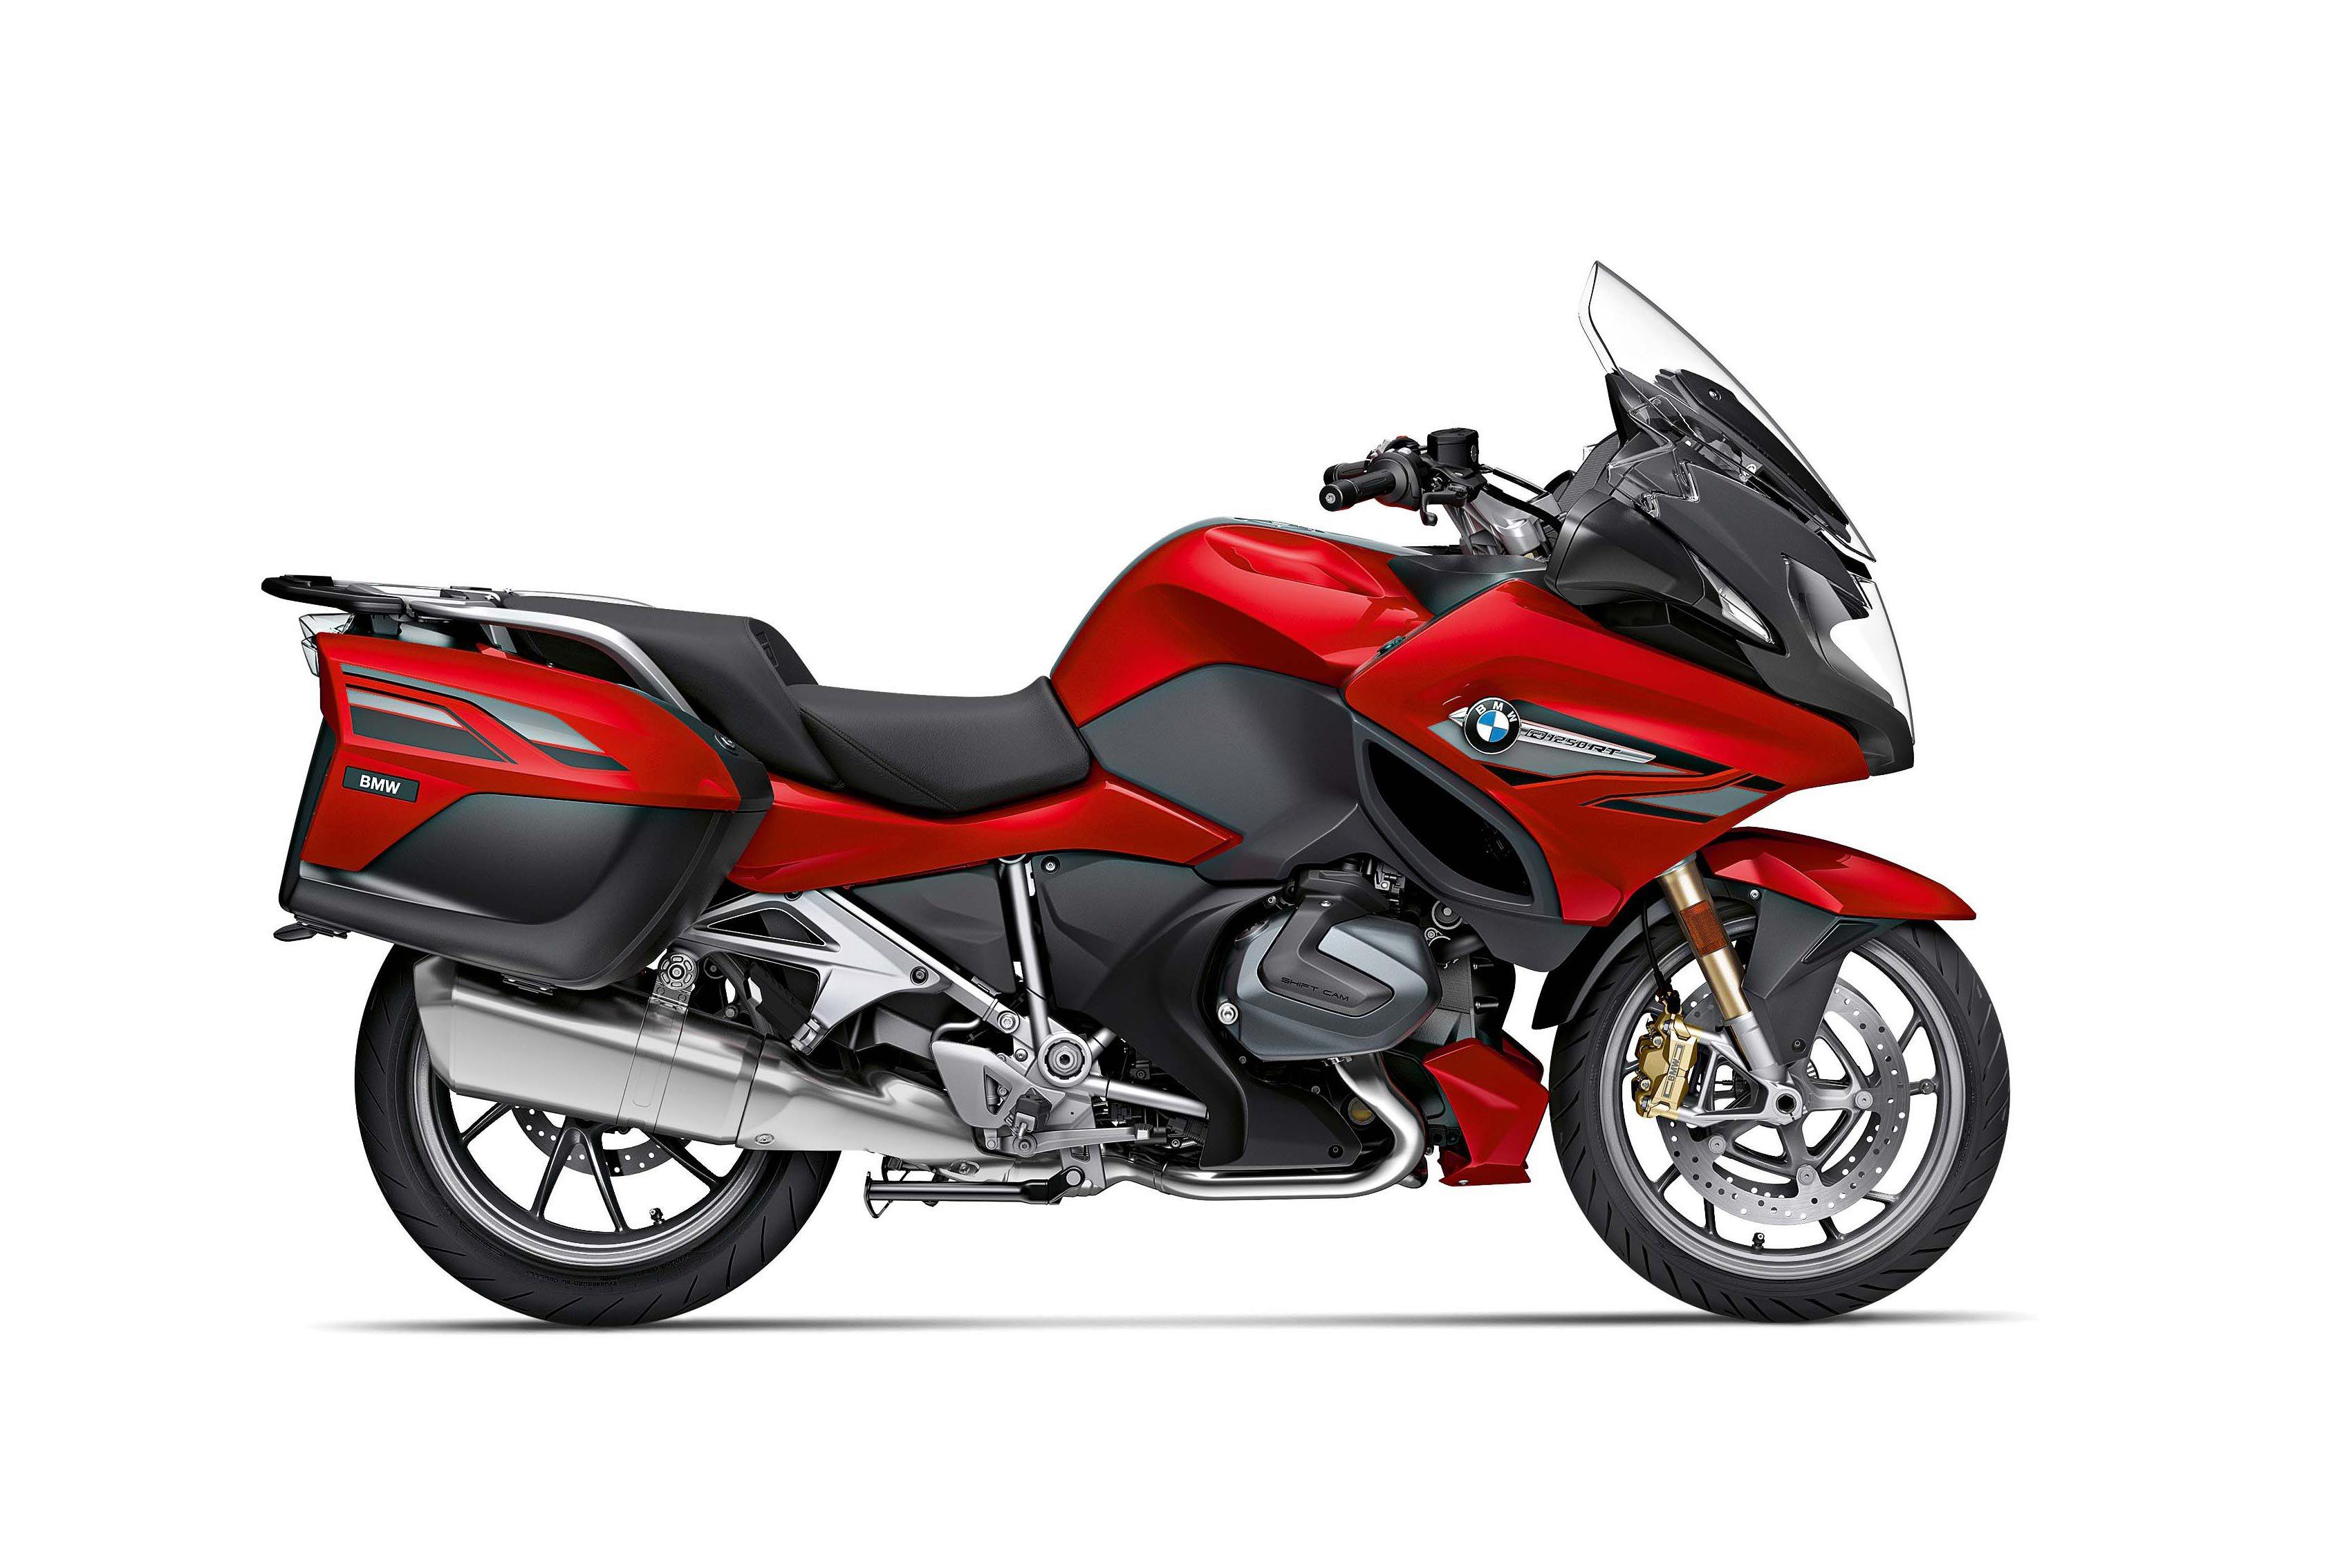 2019 Bmw R1250rt Motorcycle Nadon Sport